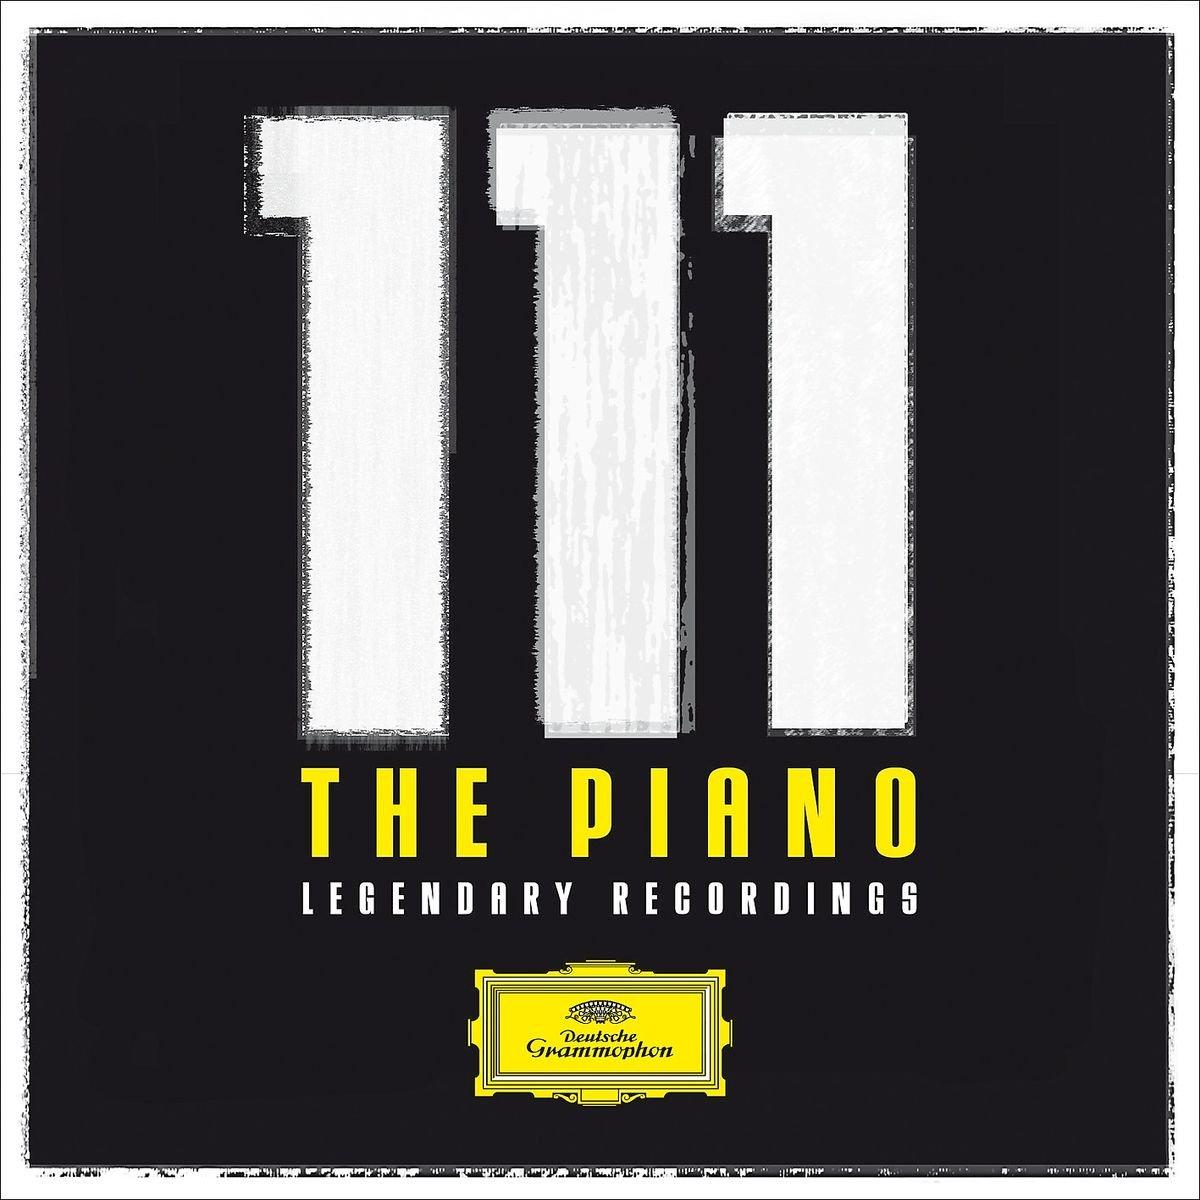 111 The Piano Legendary Recordings